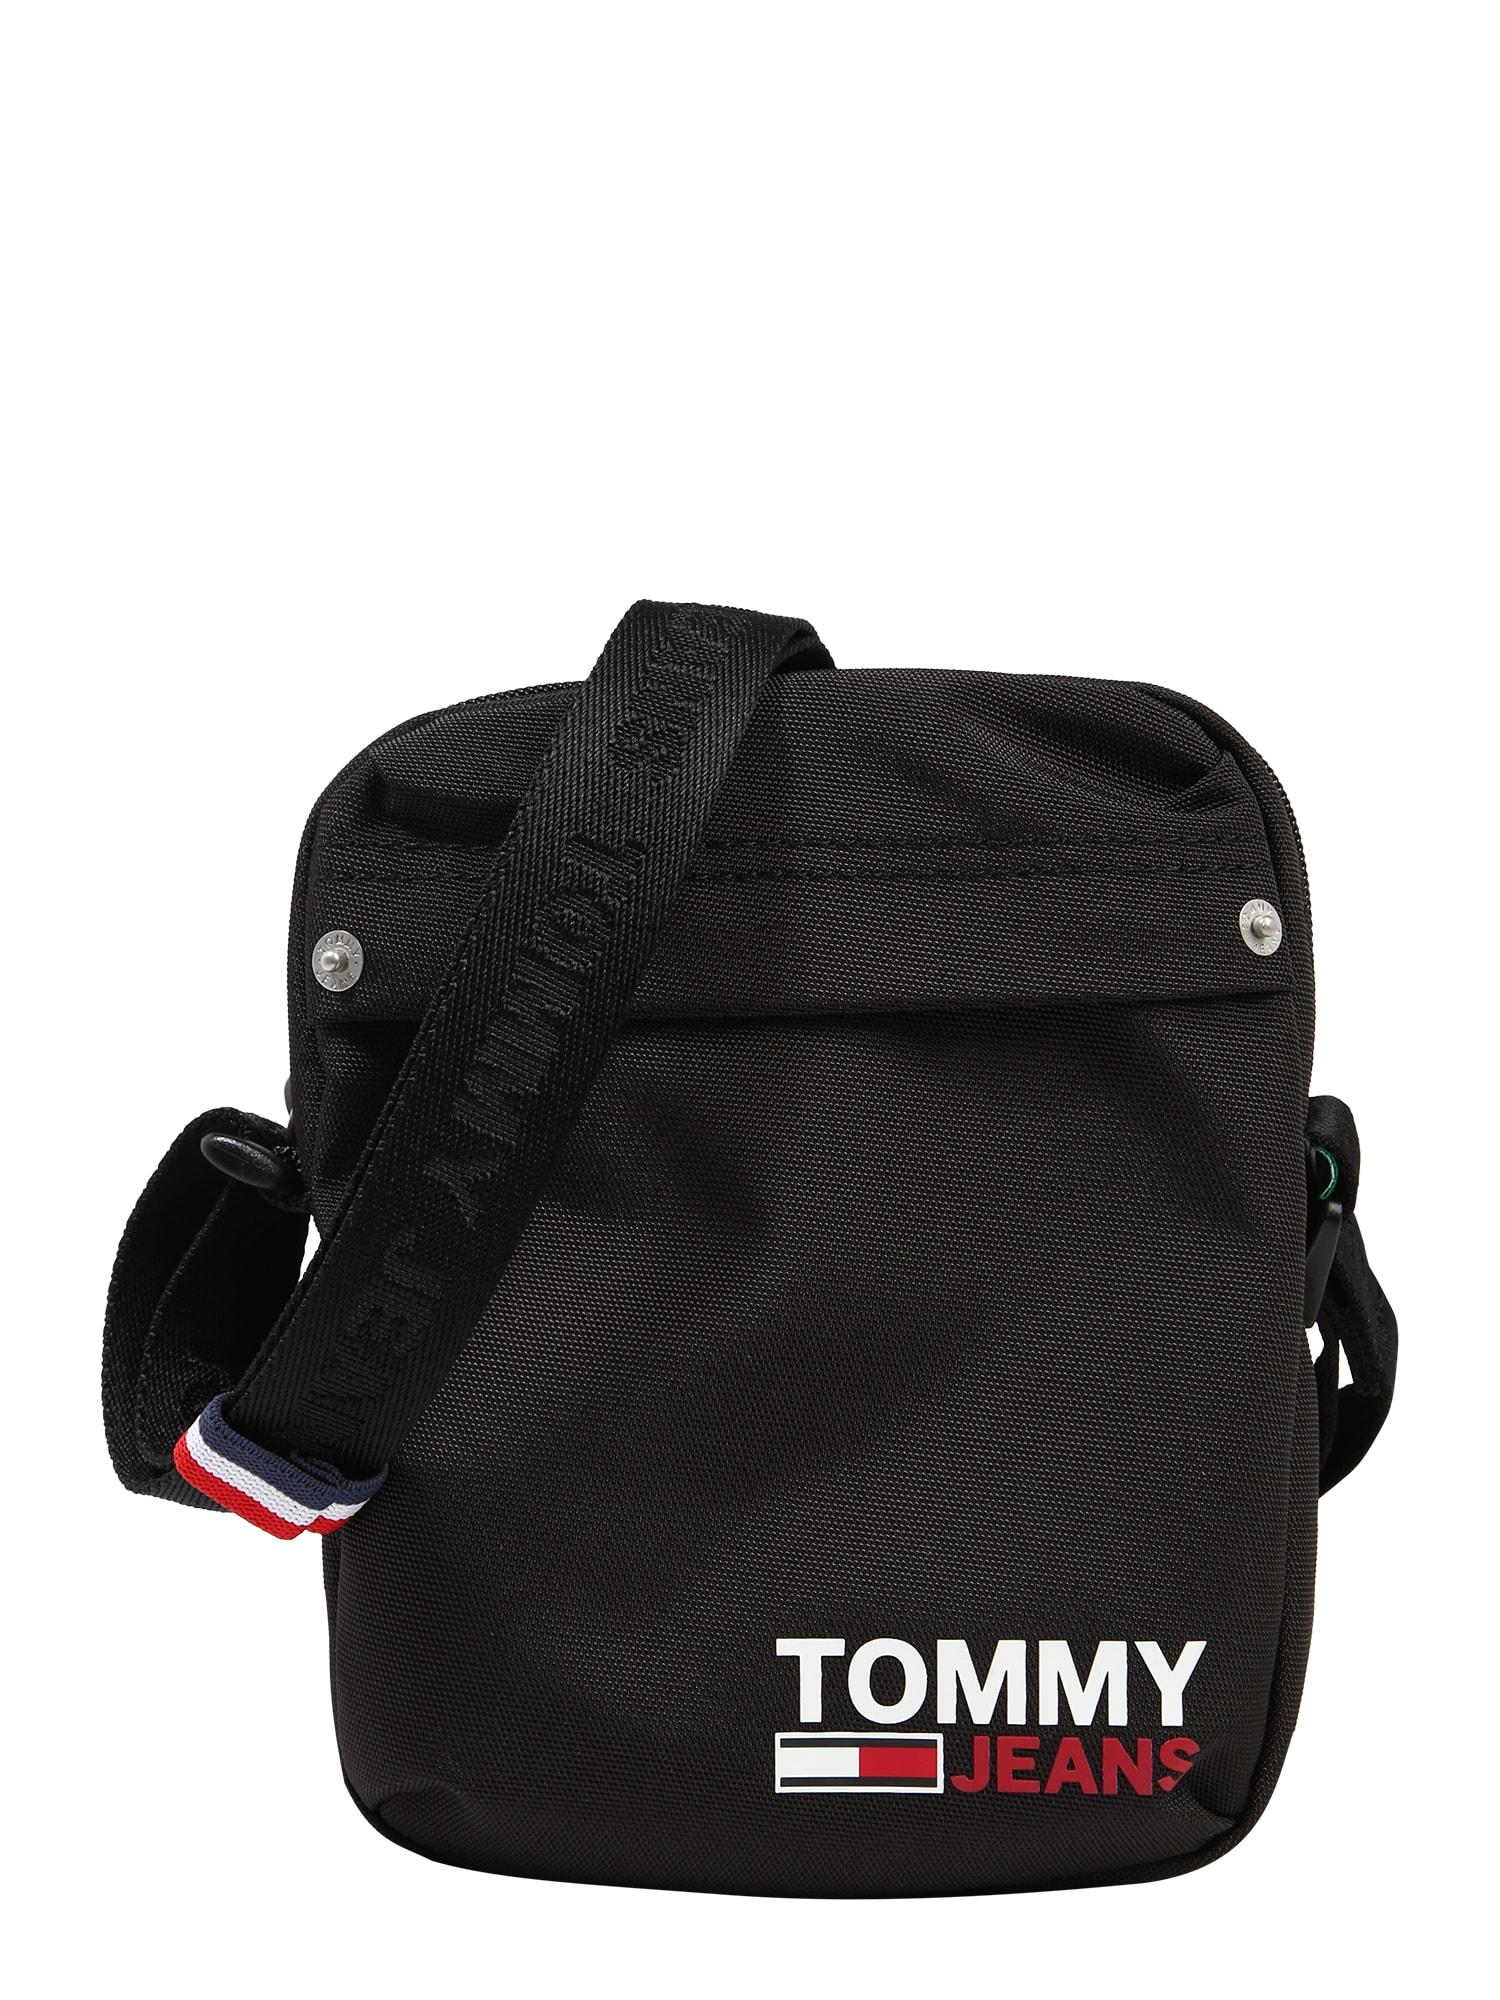 Tommy Jeans Rankinė su ilgu dirželiu